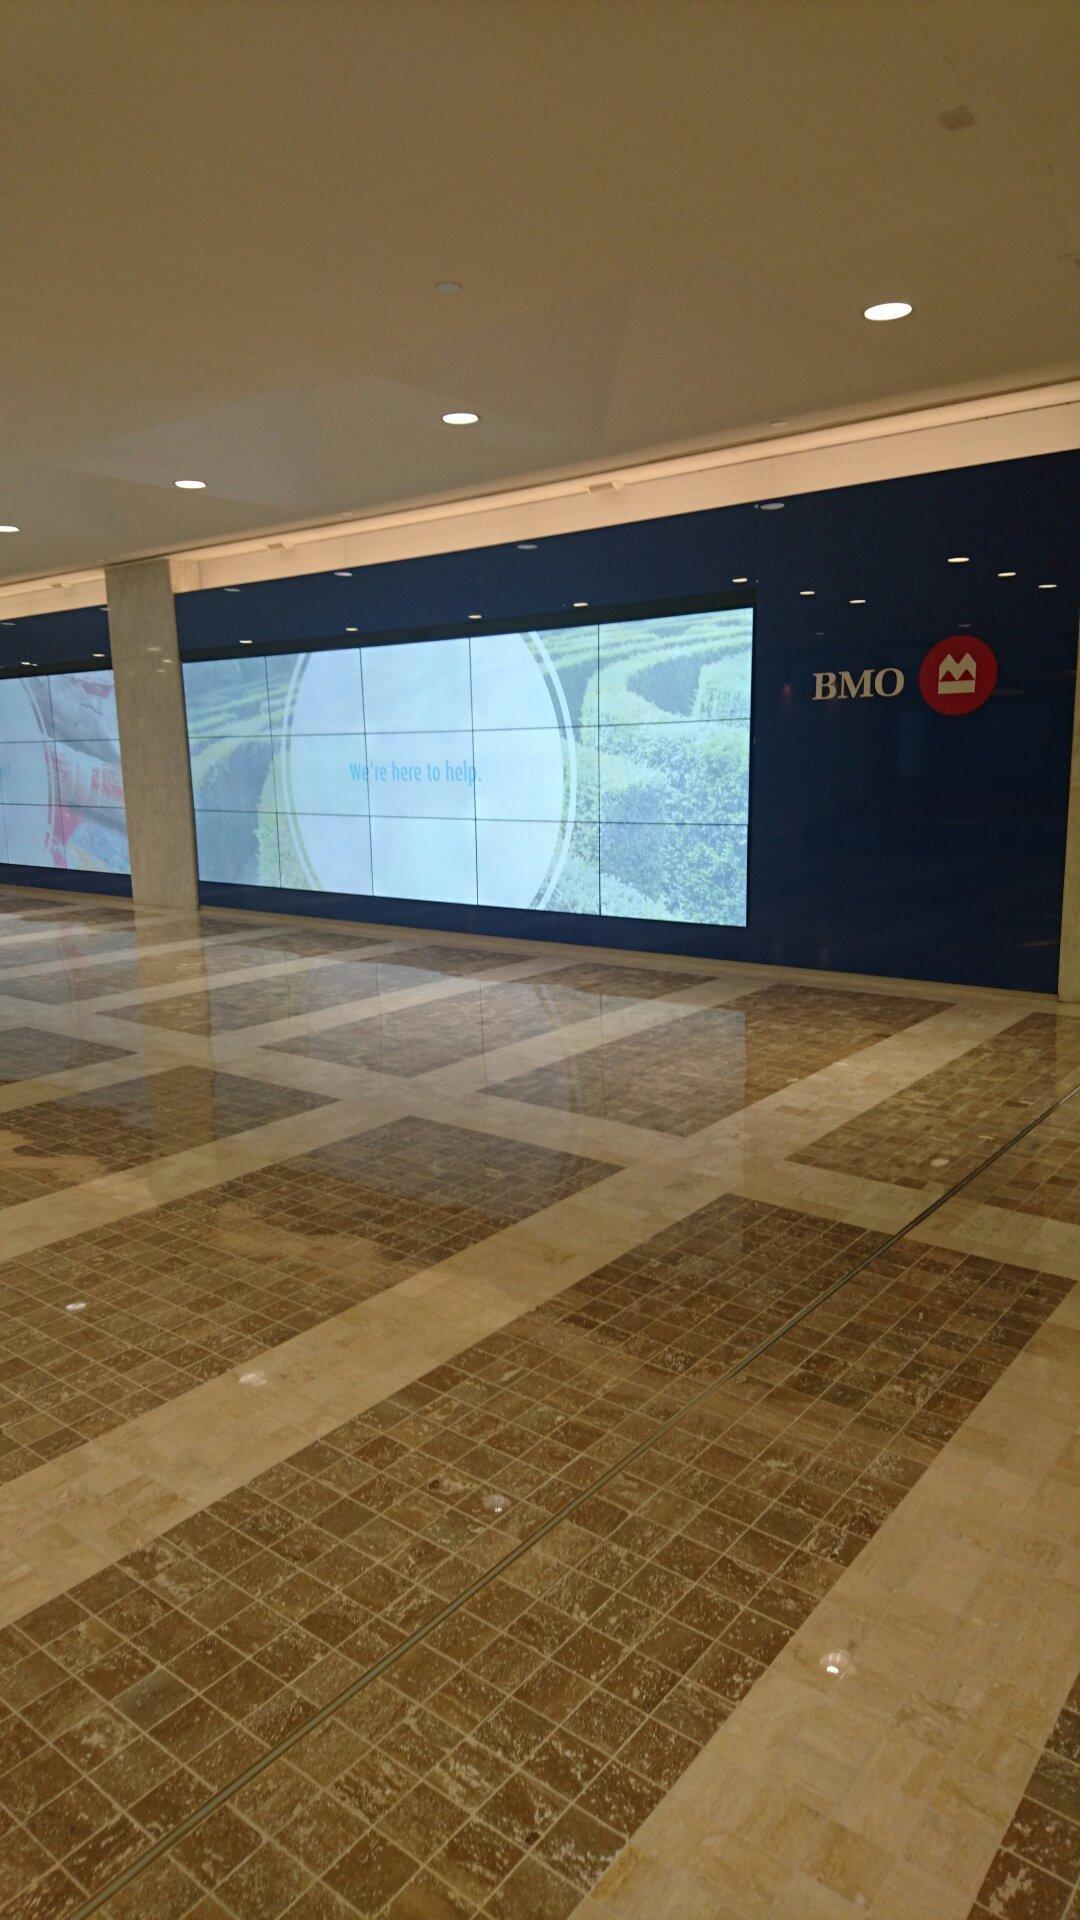 Toronto subway beneath the Bank of Montreal